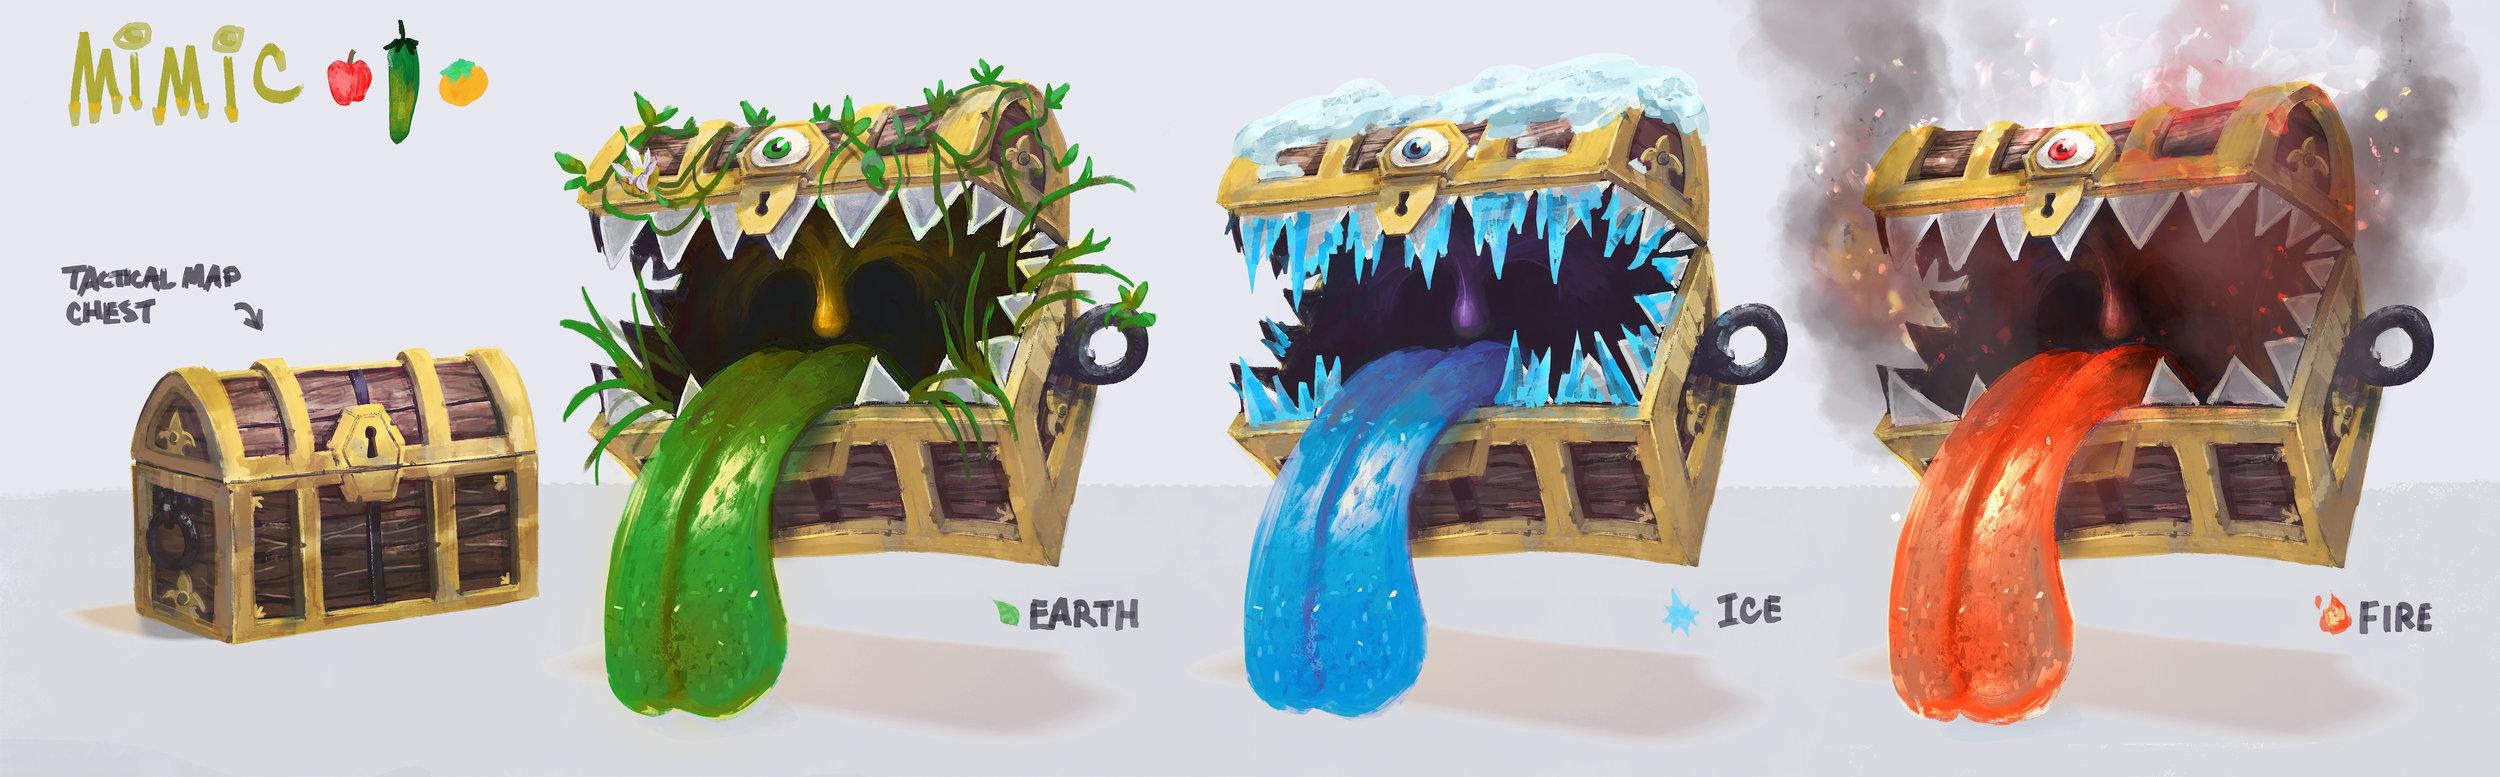 mimic_earth_ice_fire.jpg